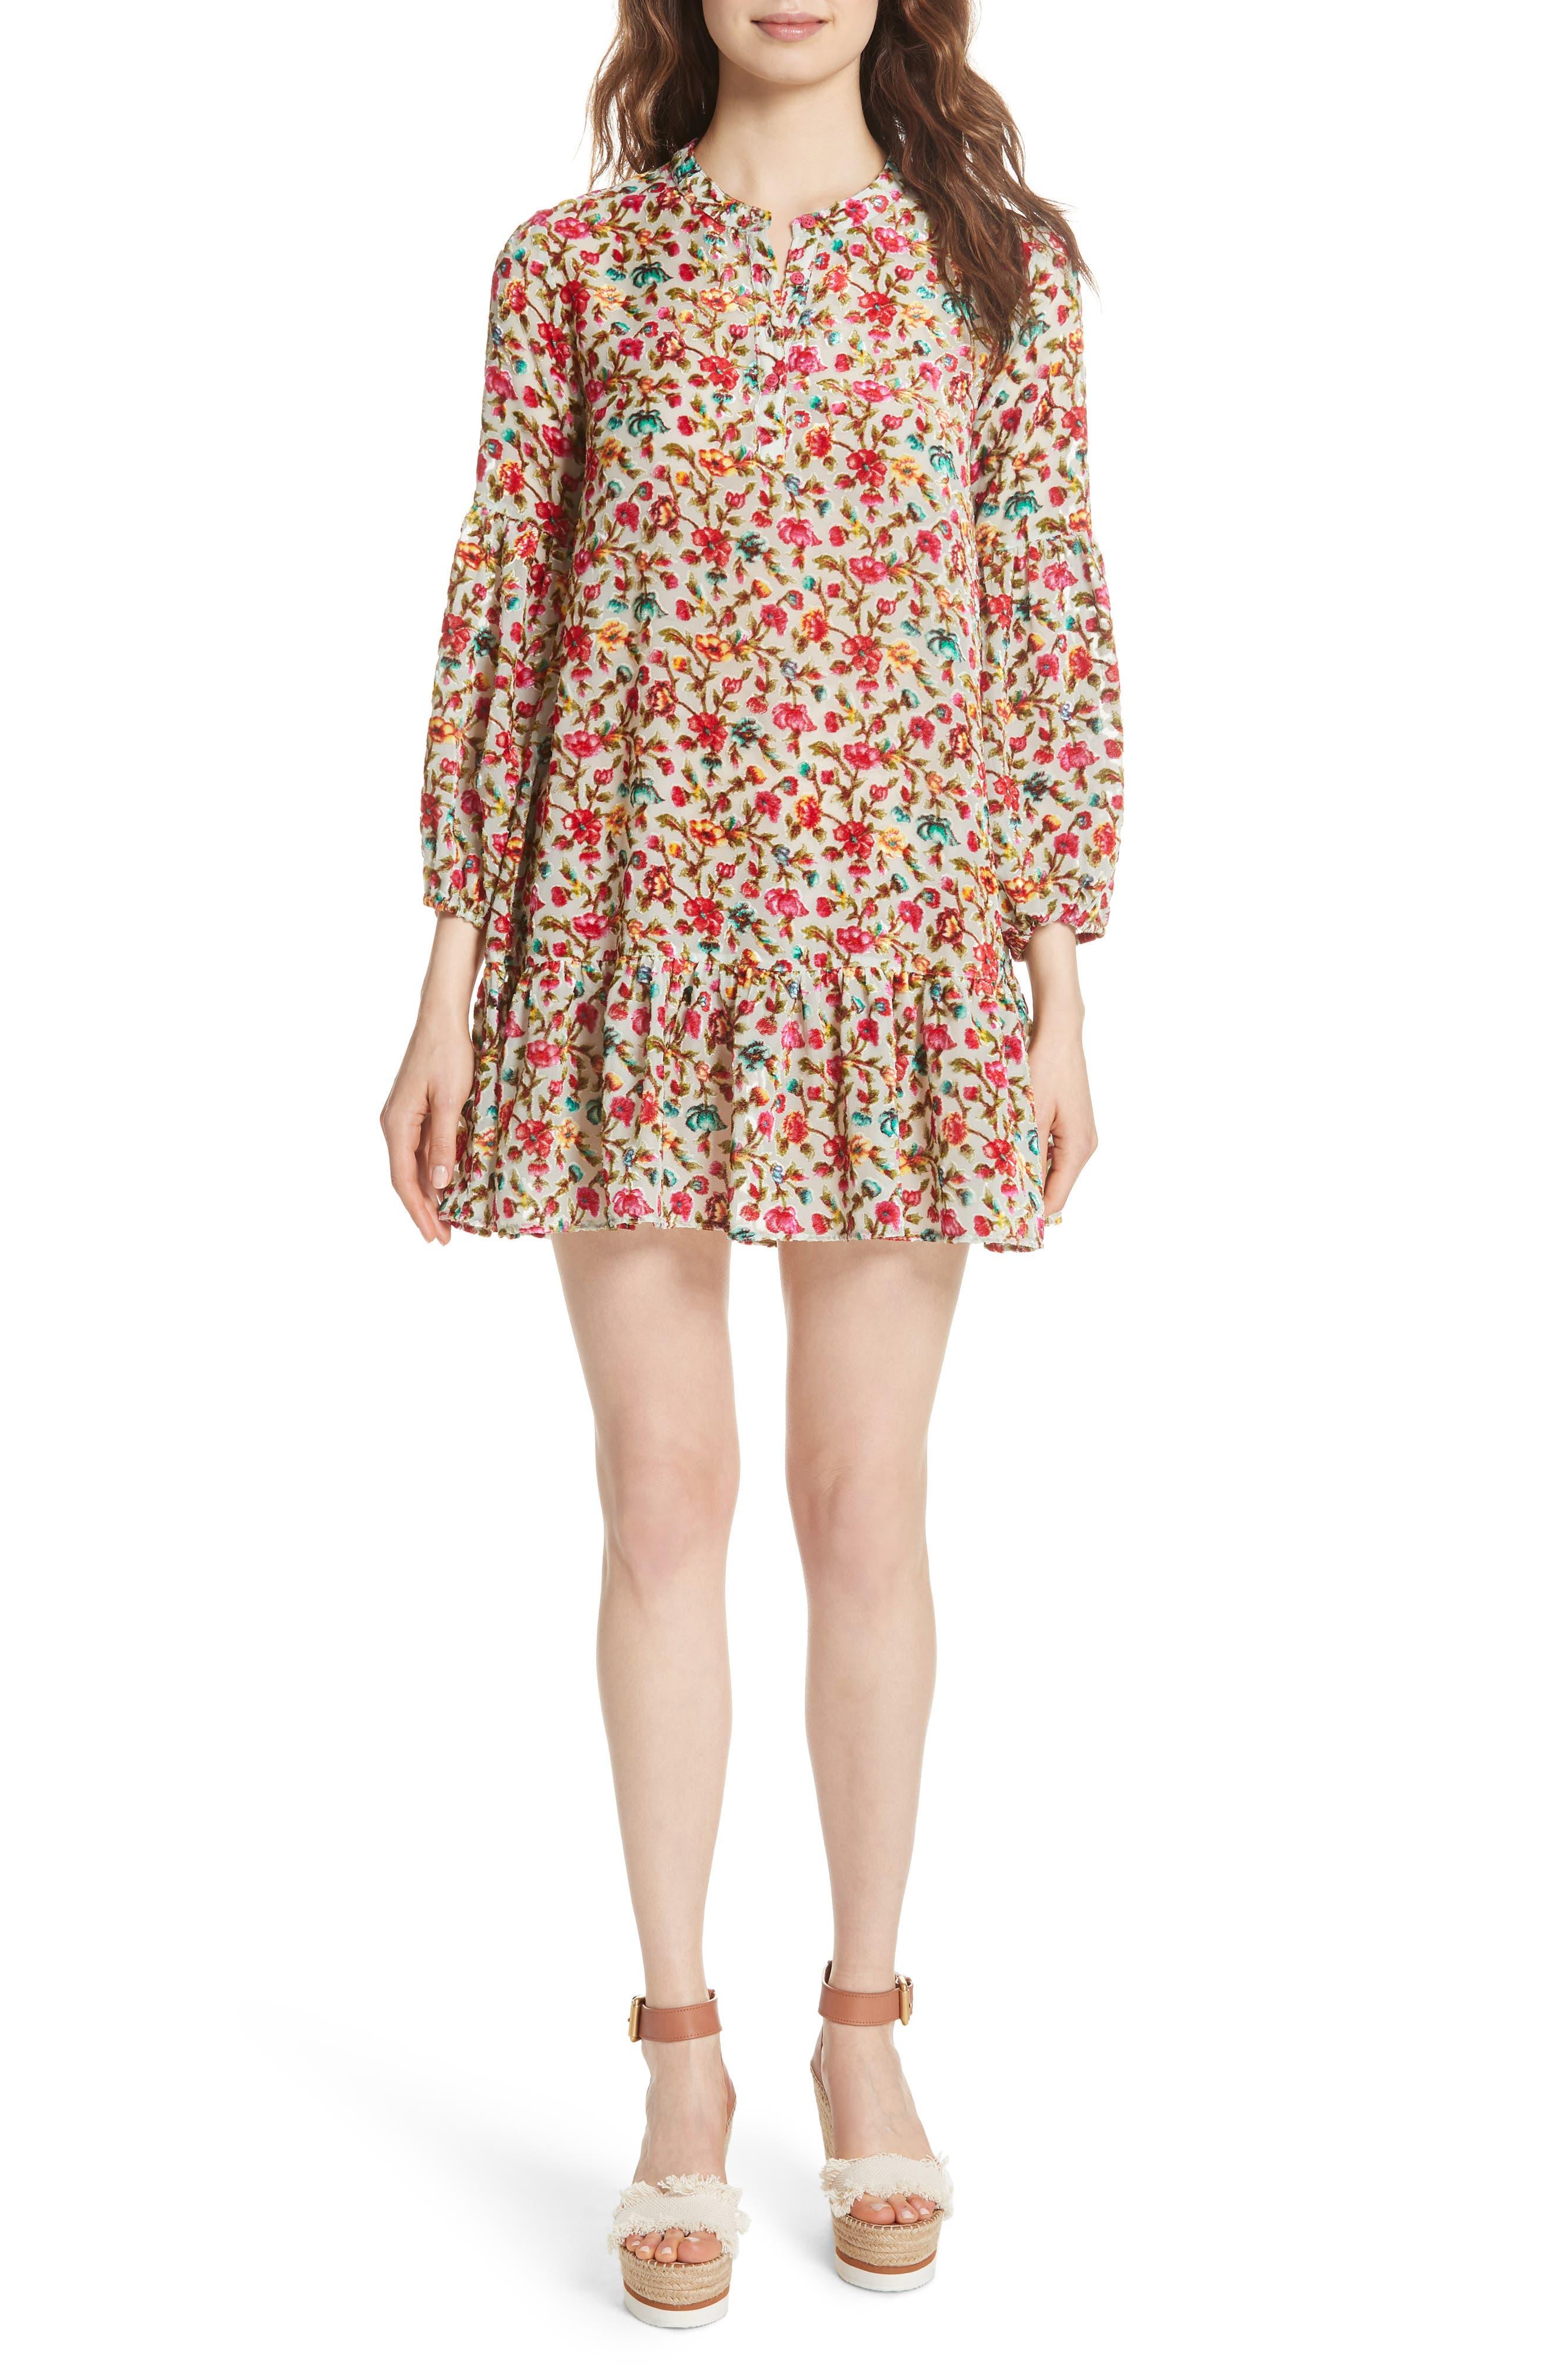 Simpson Printed Dress,                         Main,                         color, 693